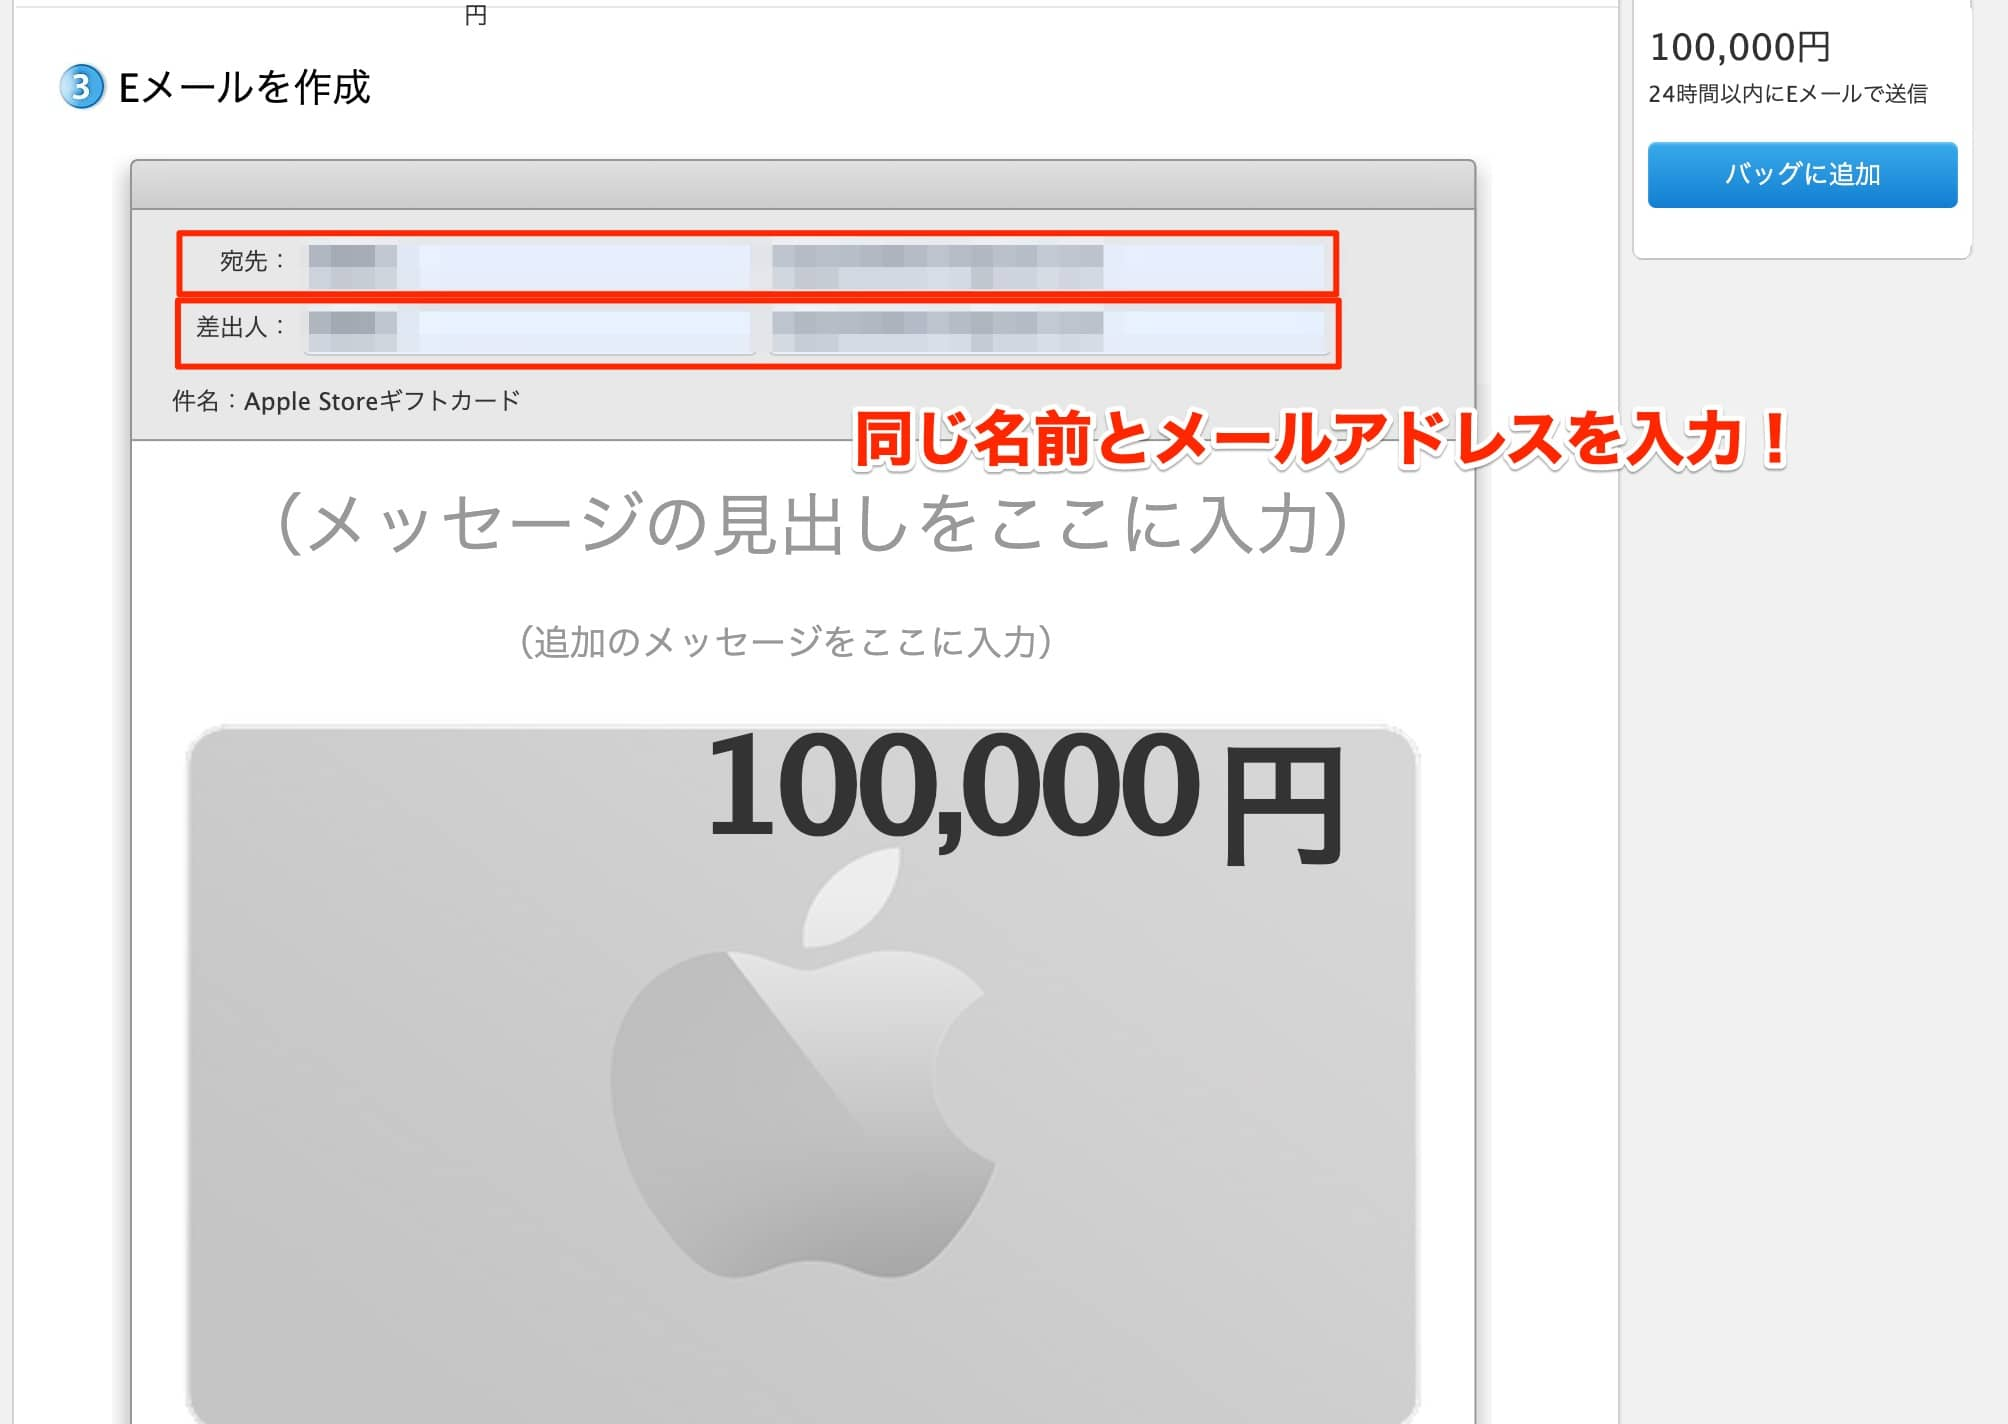 appleギフトカードを自分宛に届くよう入力